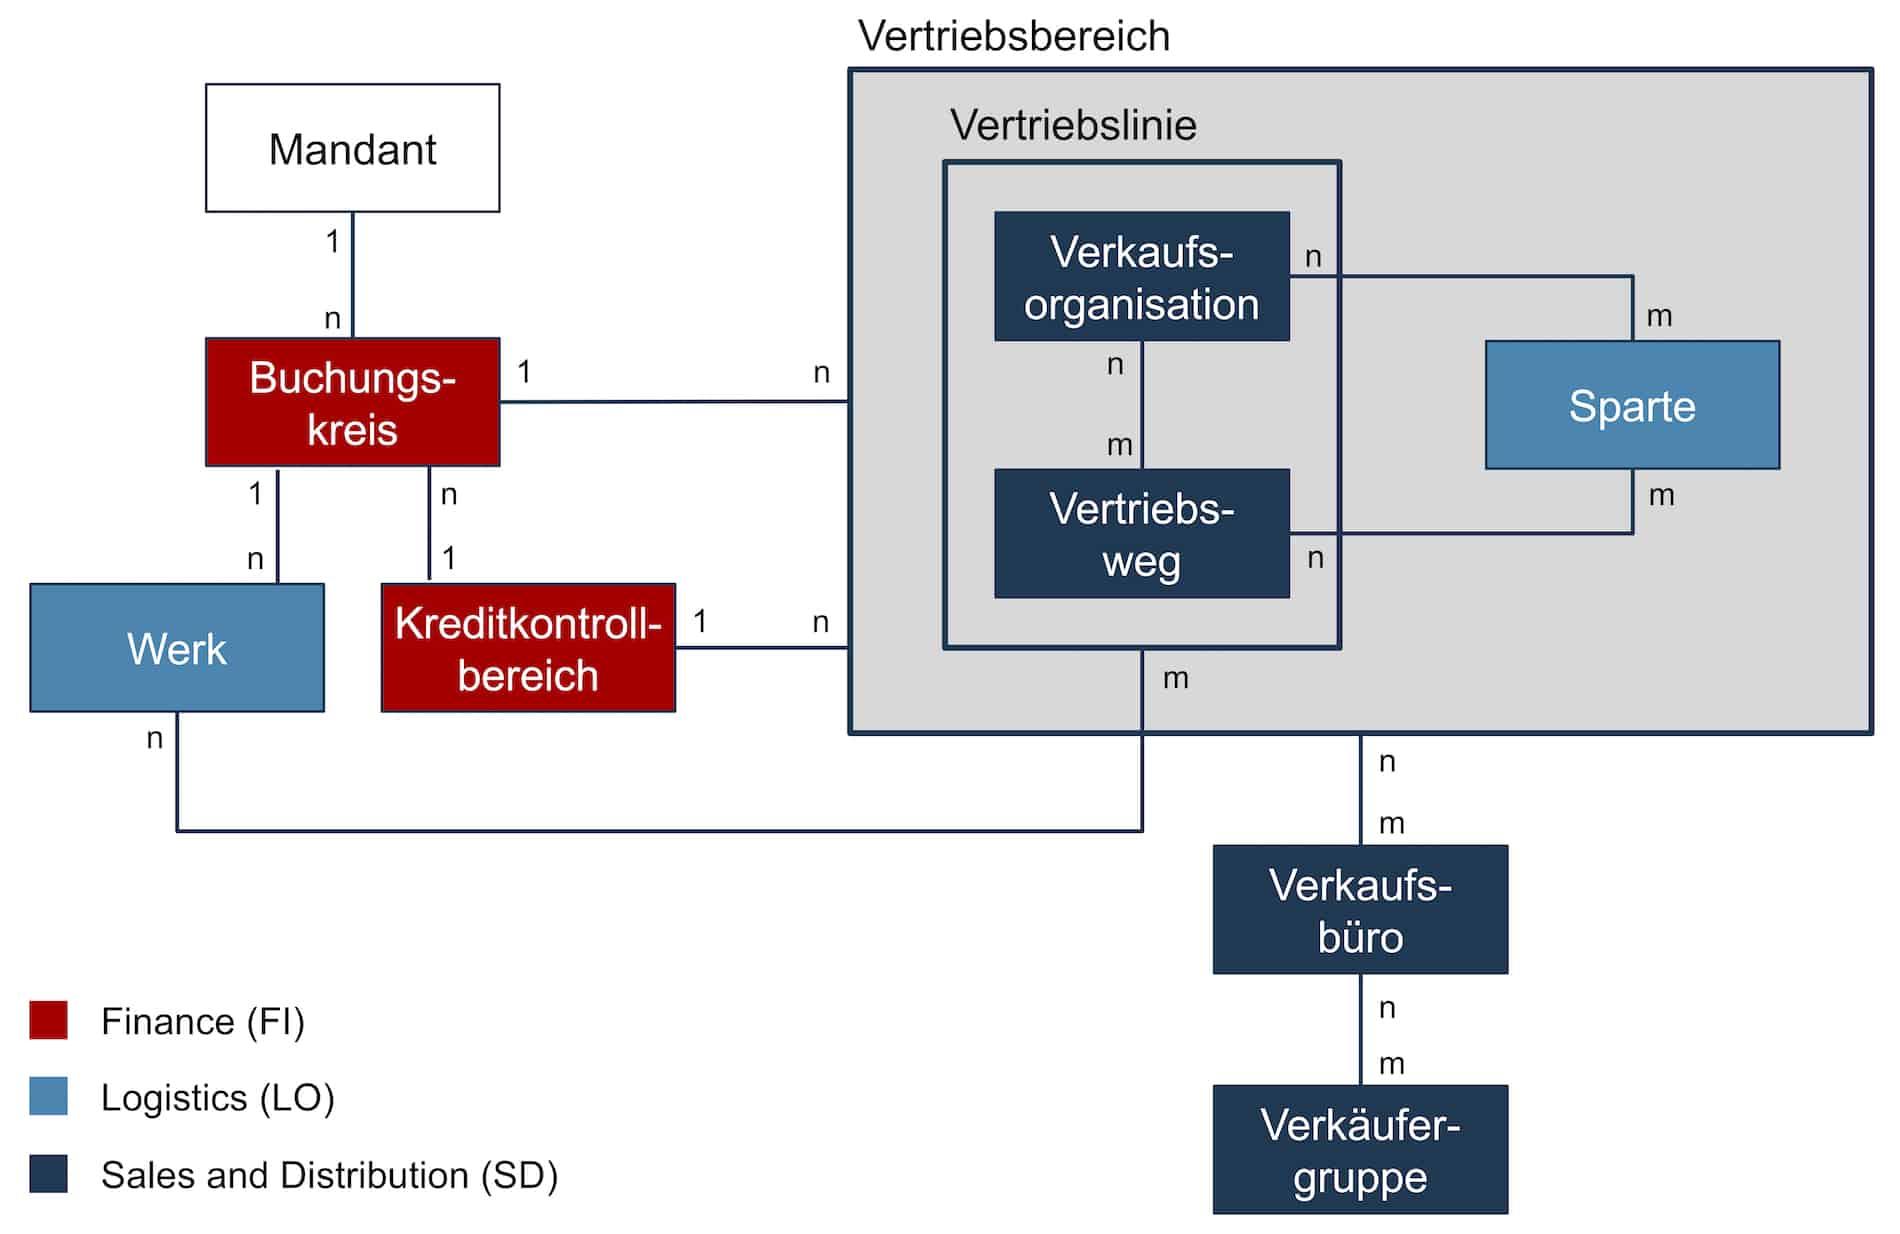 Tipps Aufbau Vertriebsstruktur_1